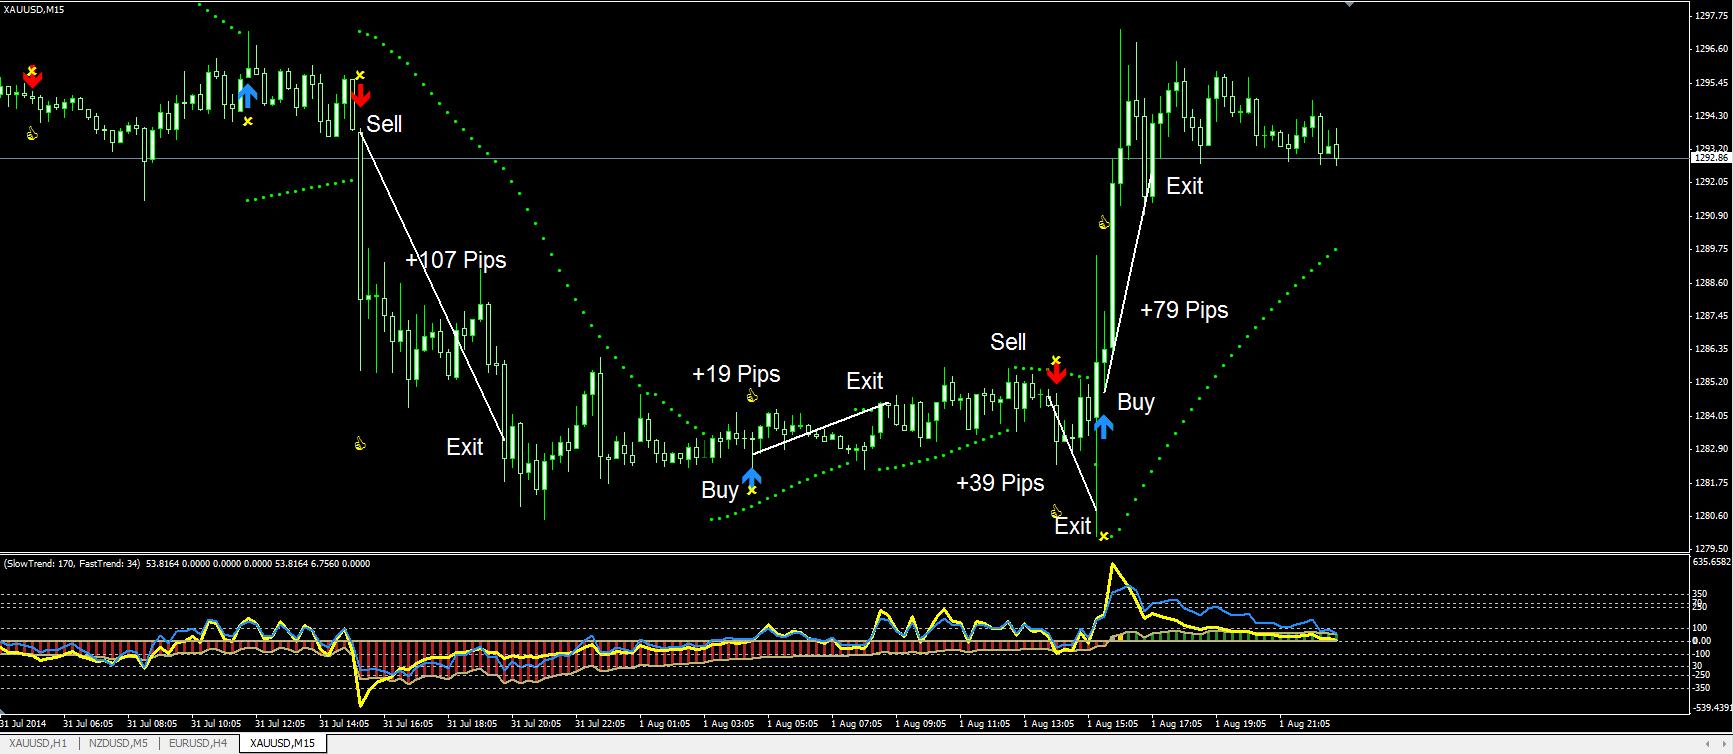 Symphonie trading signals 1.7